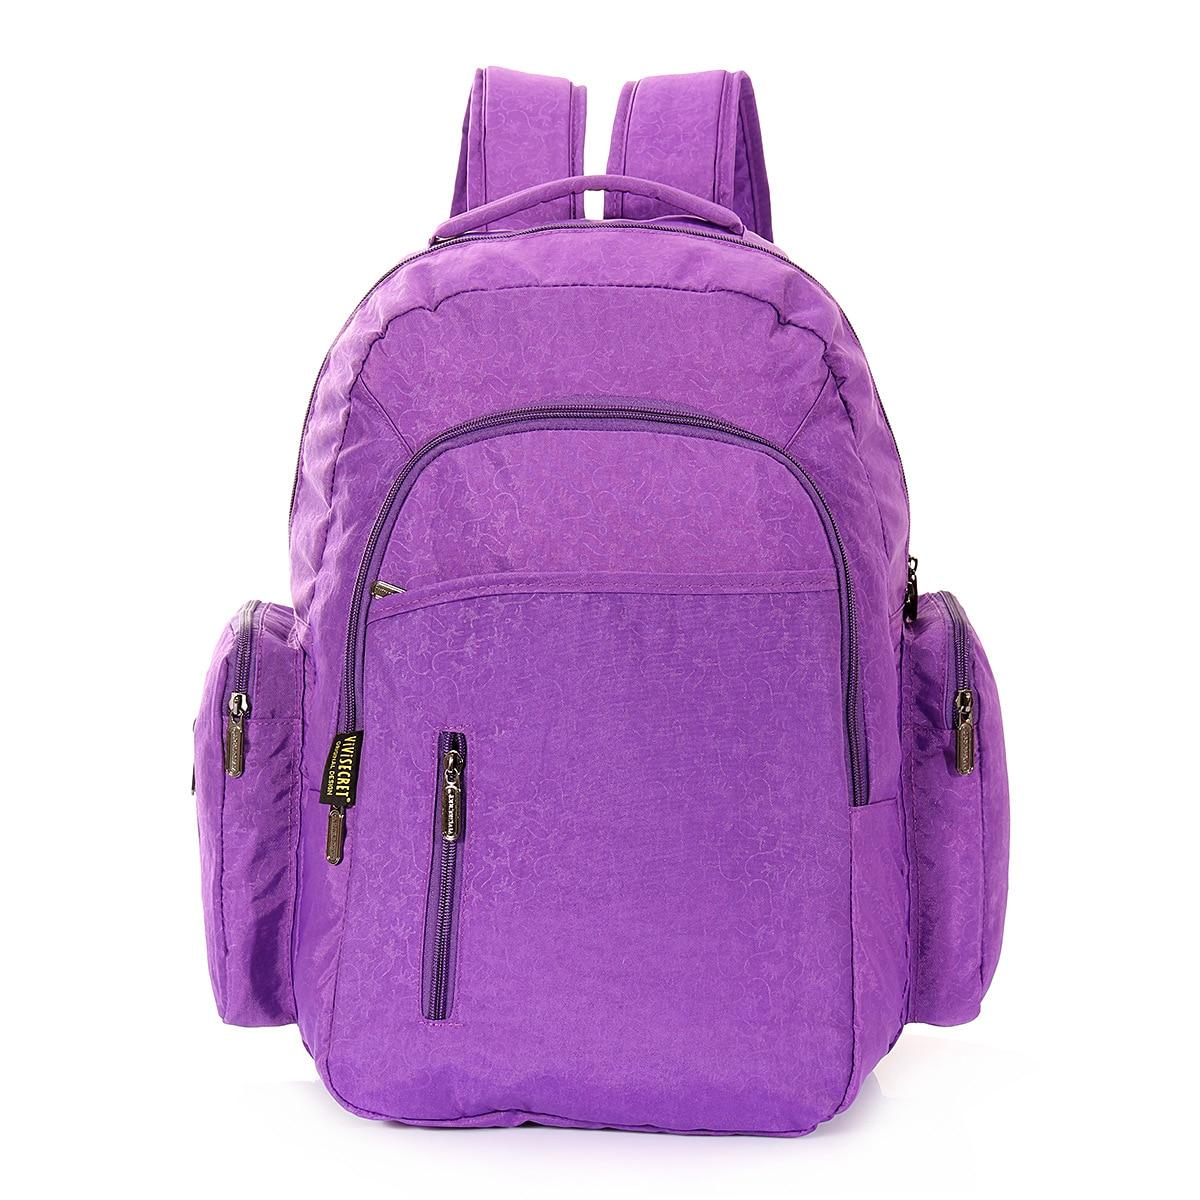 2019 New Style Korean-style Diaper Bag Mummy Backpack Shoulder Multi-functional Large-Volume Nursing Baoma Travel Bag